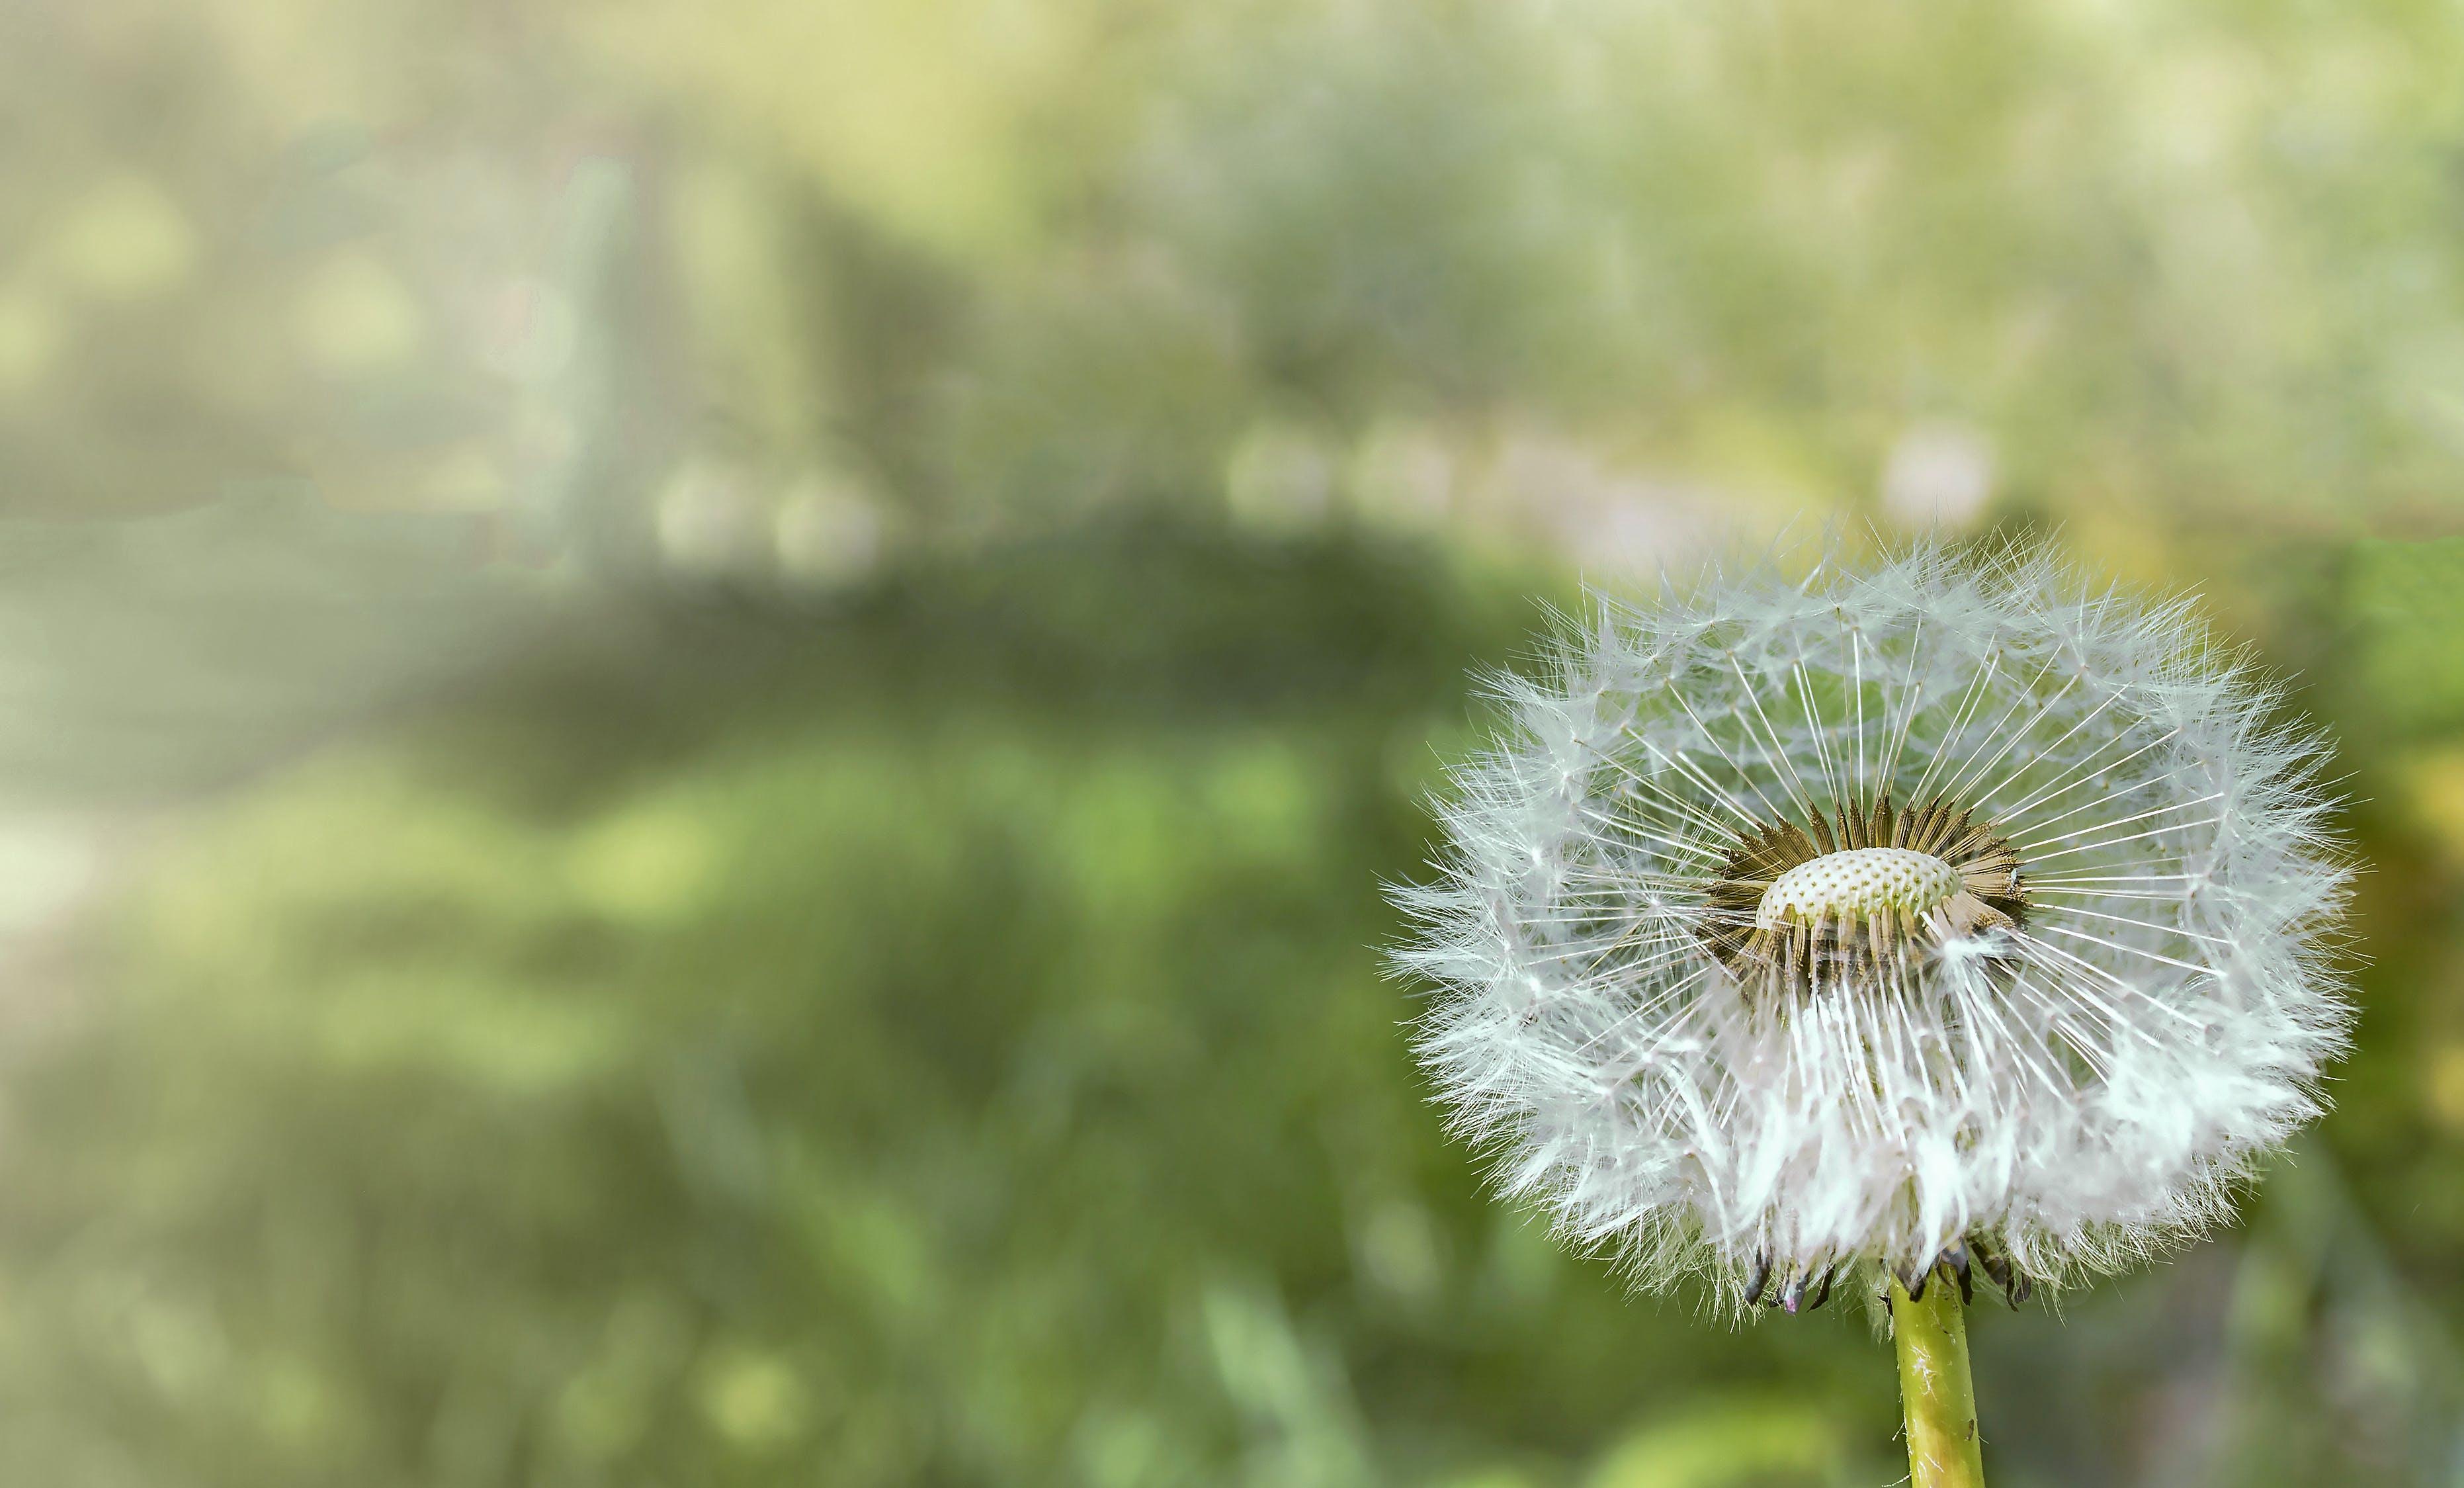 Closeup Photograph of White Dandelion